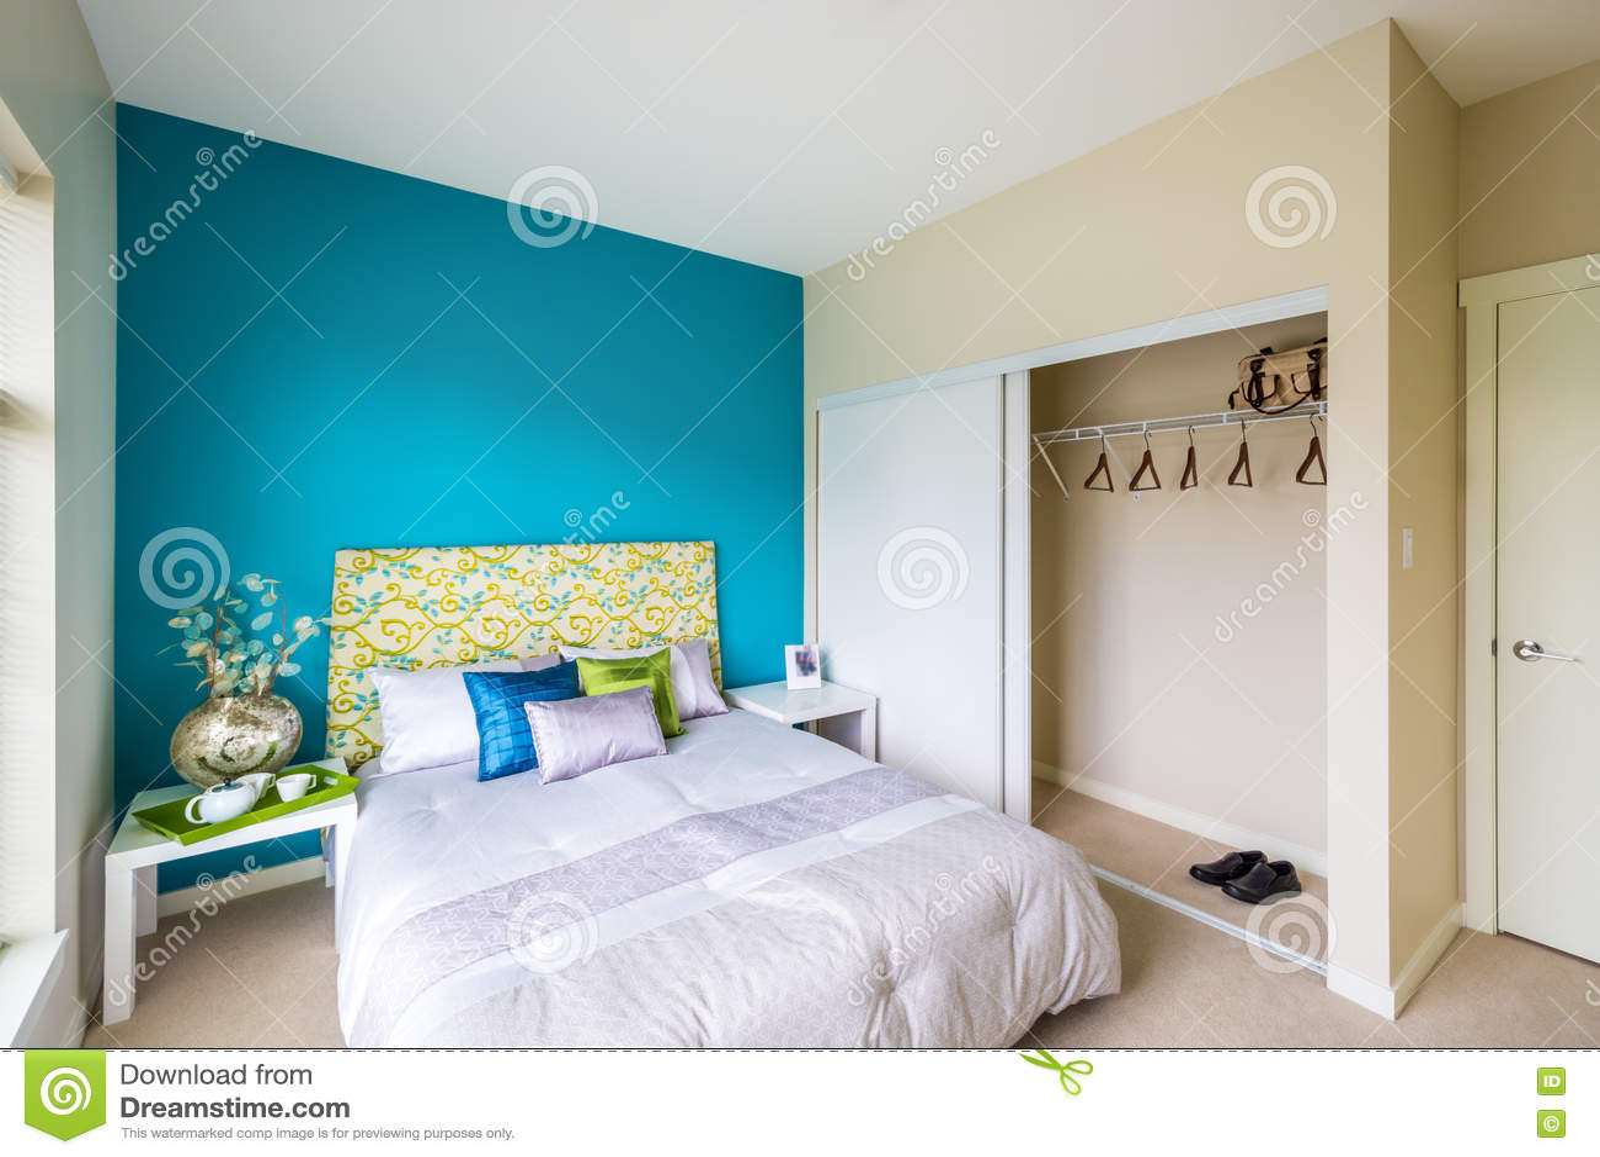 moderne blauwe slaapkamer stock foto - afbeelding: 72282023, Deco ideeën